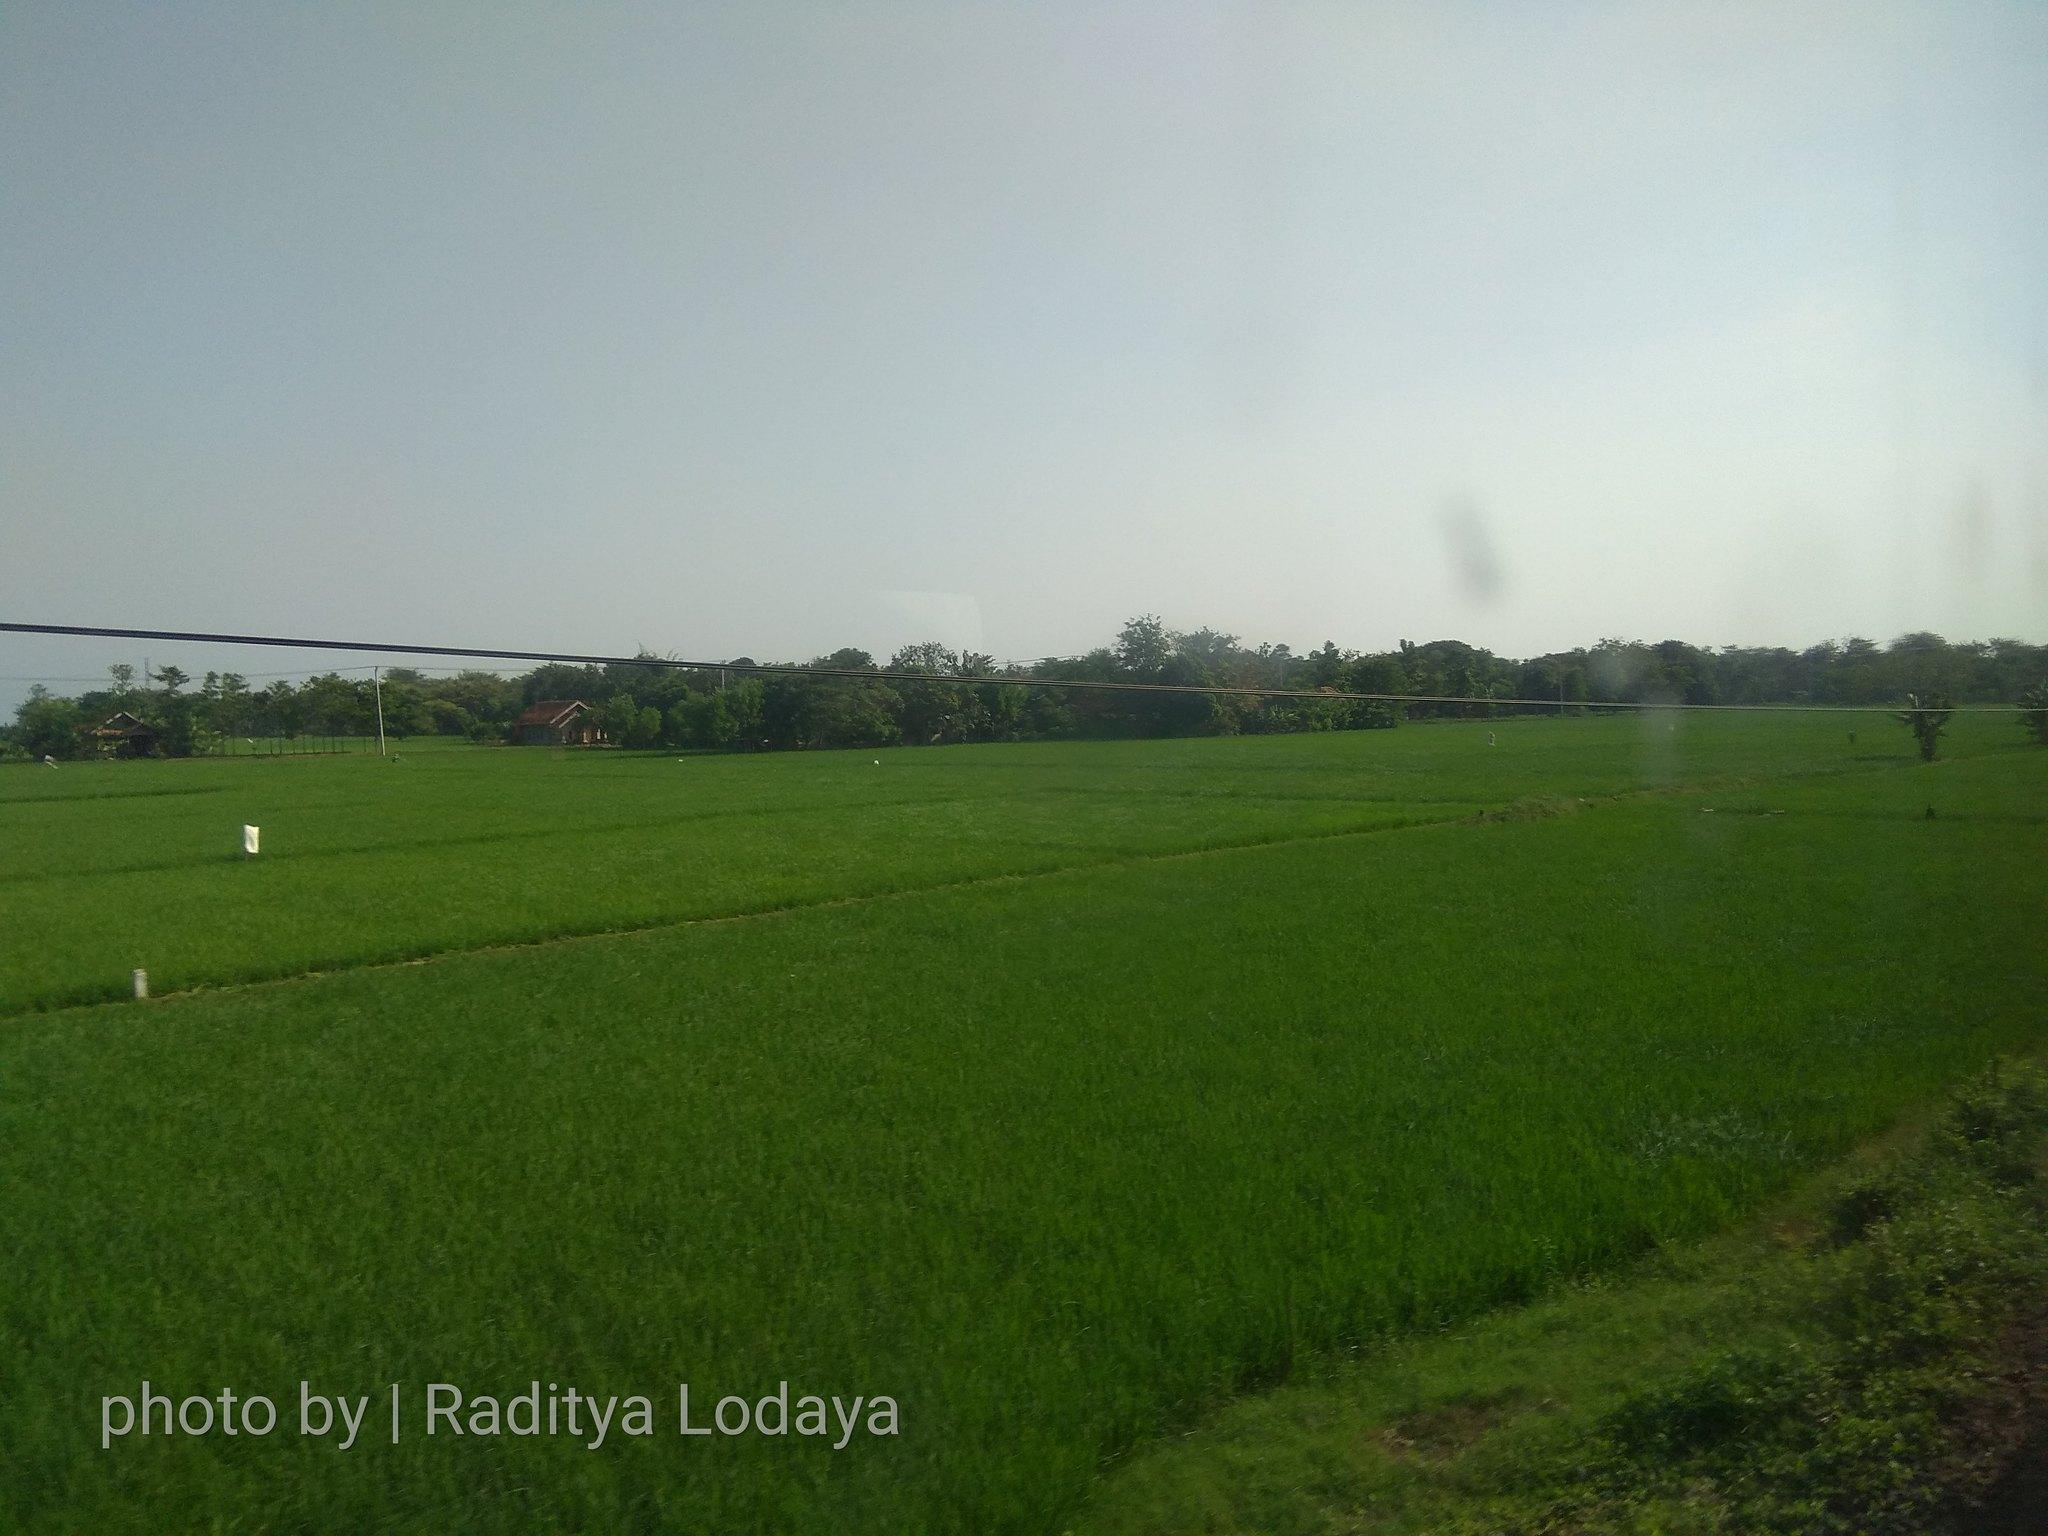 21 TRIP REPORT KERETA API JAYABAYA 1 (JAKARTA-CIREBON) -- KABUPATEN INDRAMAYU